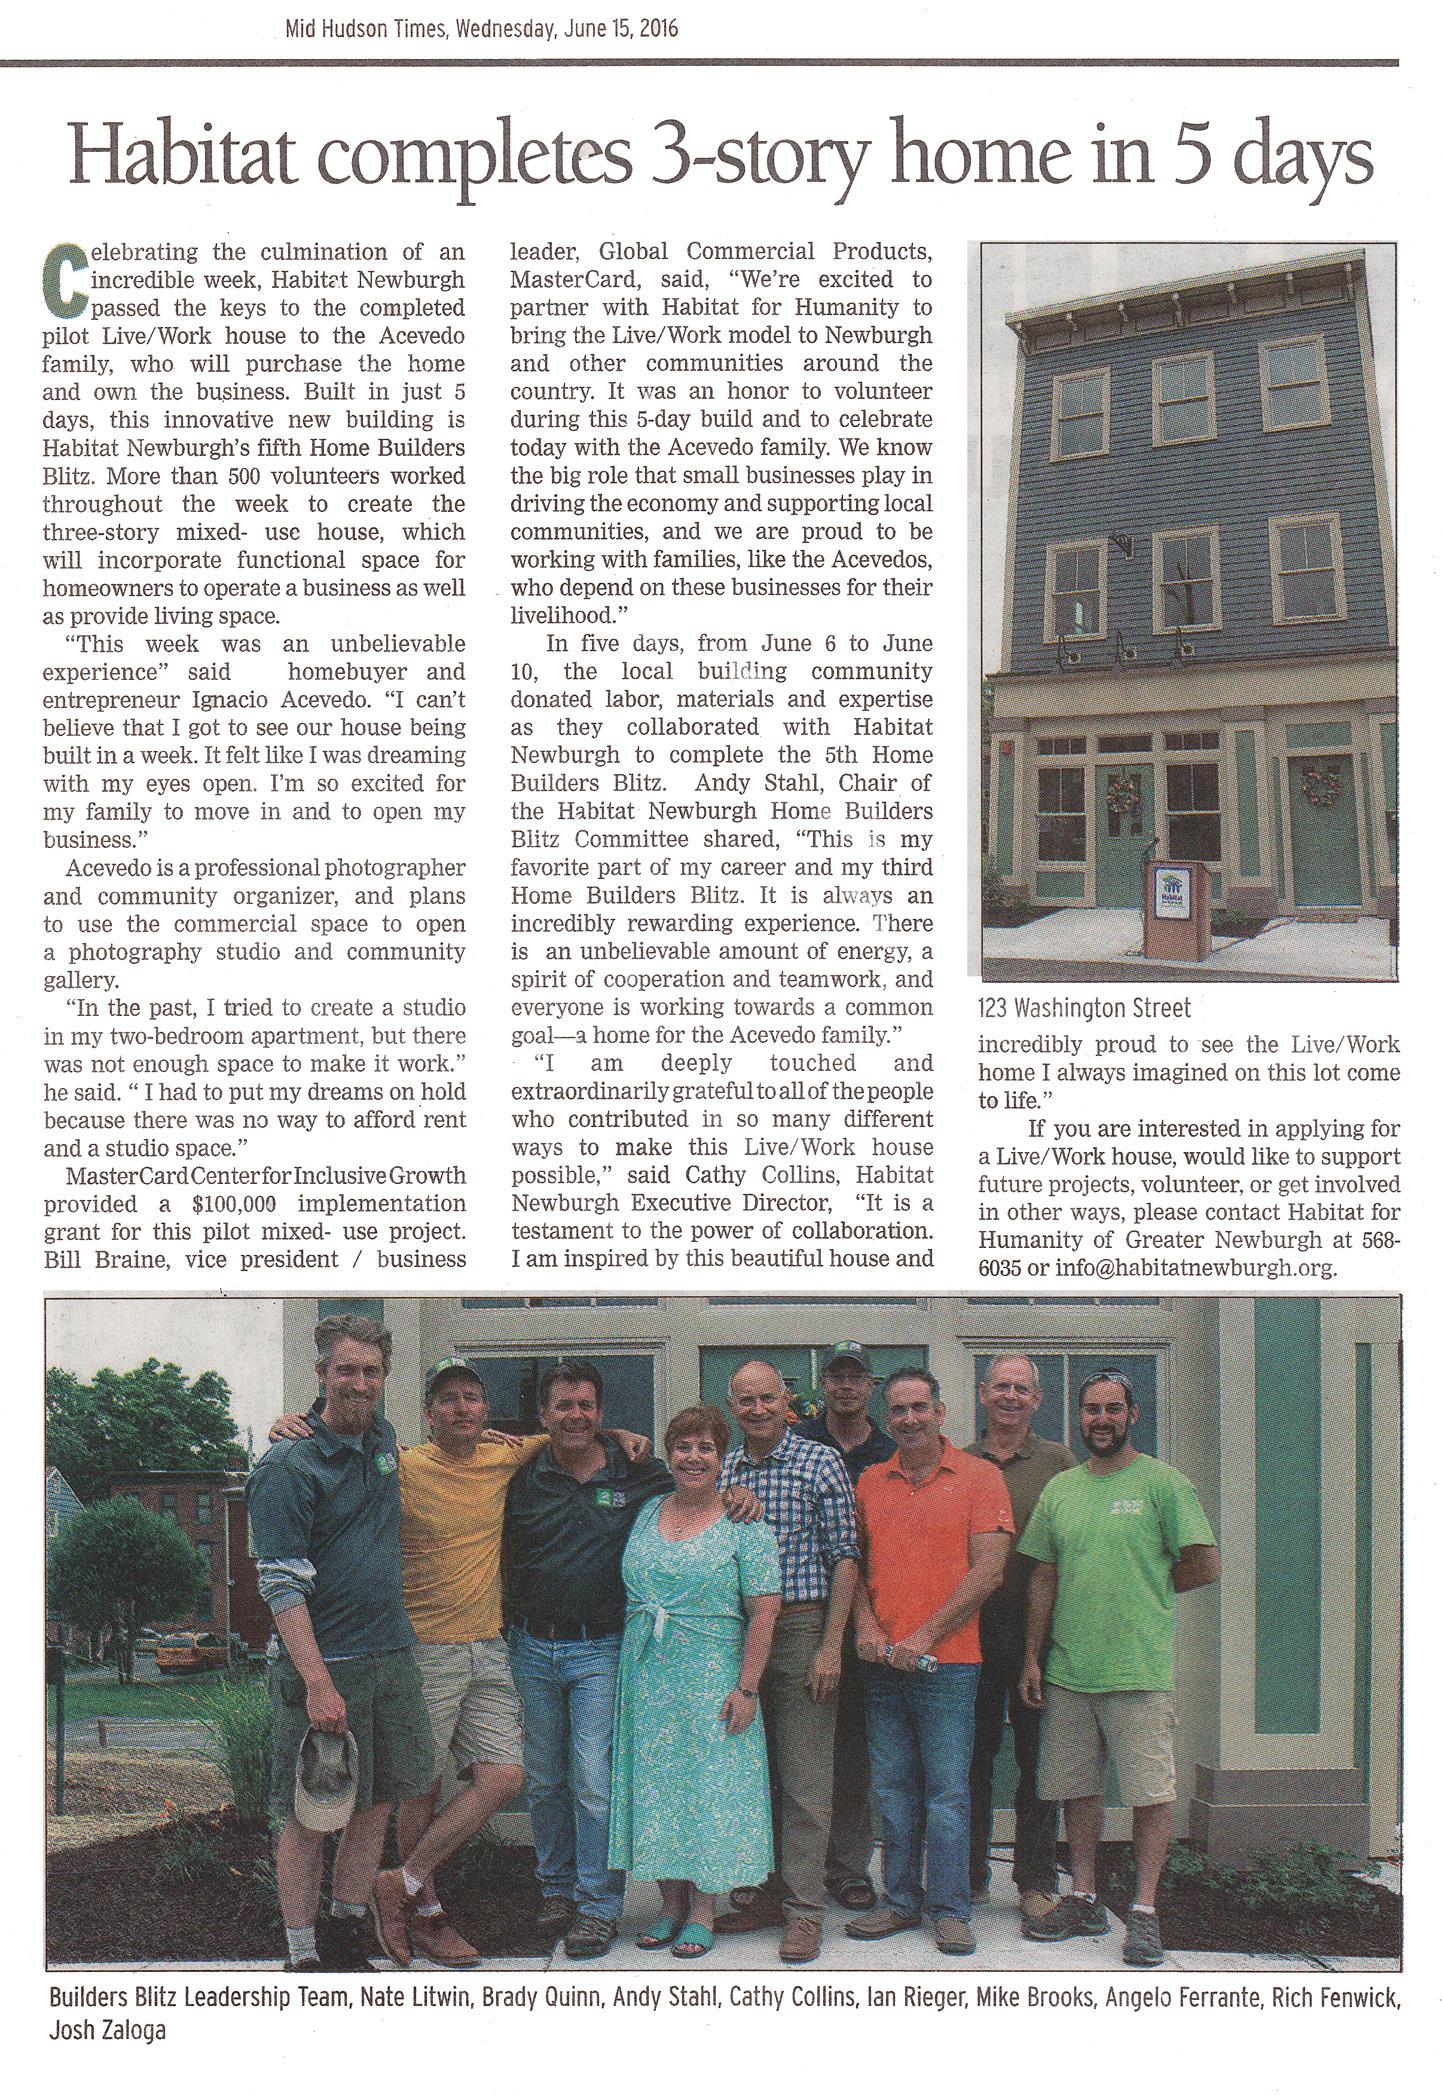 Rieger Homes, Habitat For Humanity, Builders Blitz 2016